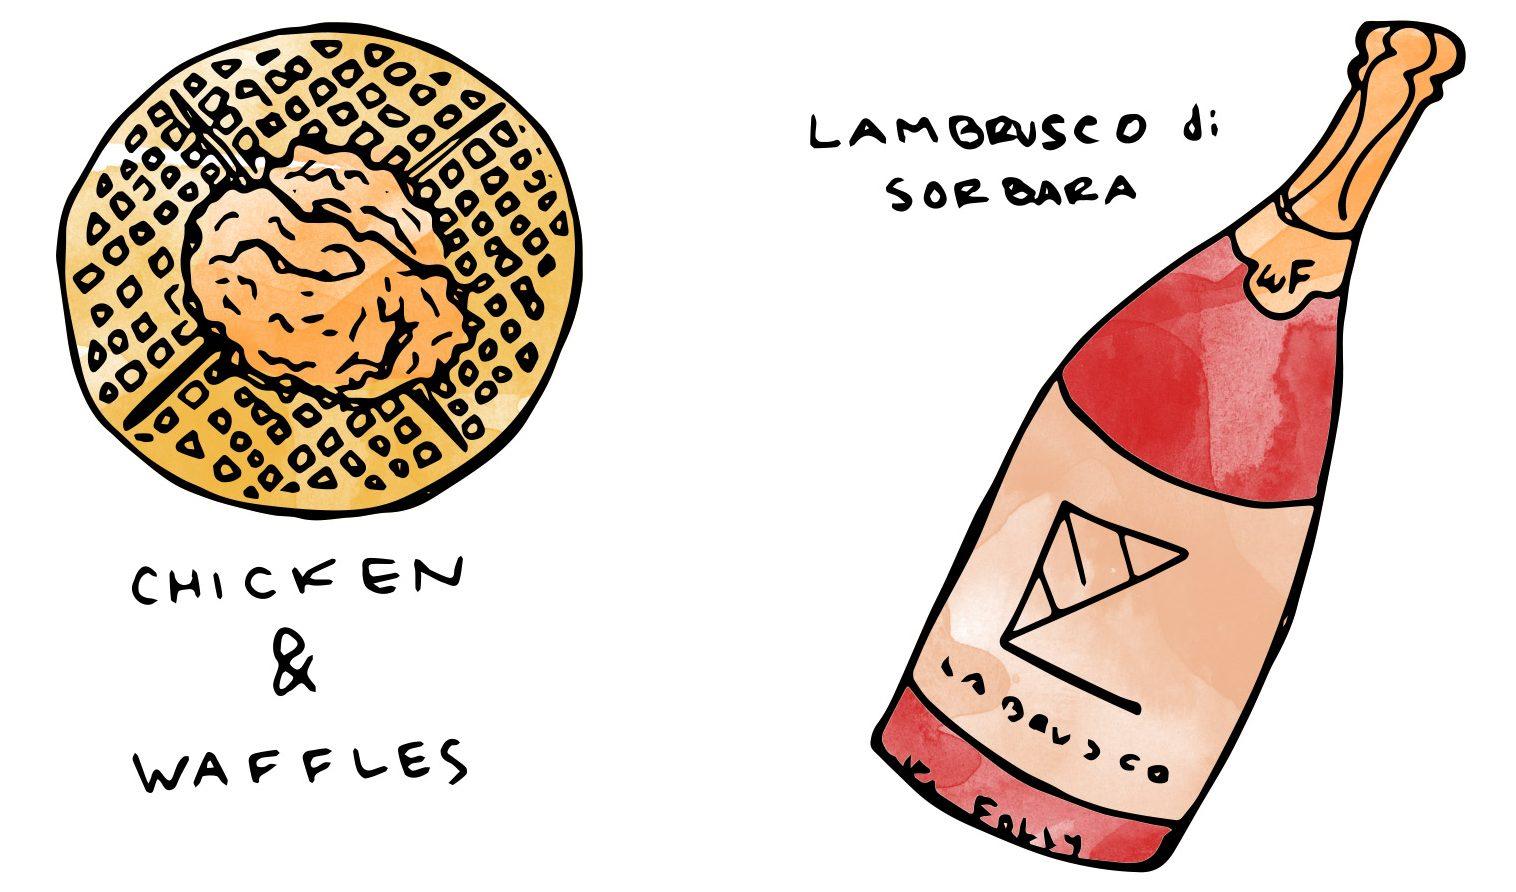 chicken-waffles-illustration-breakfast-wine